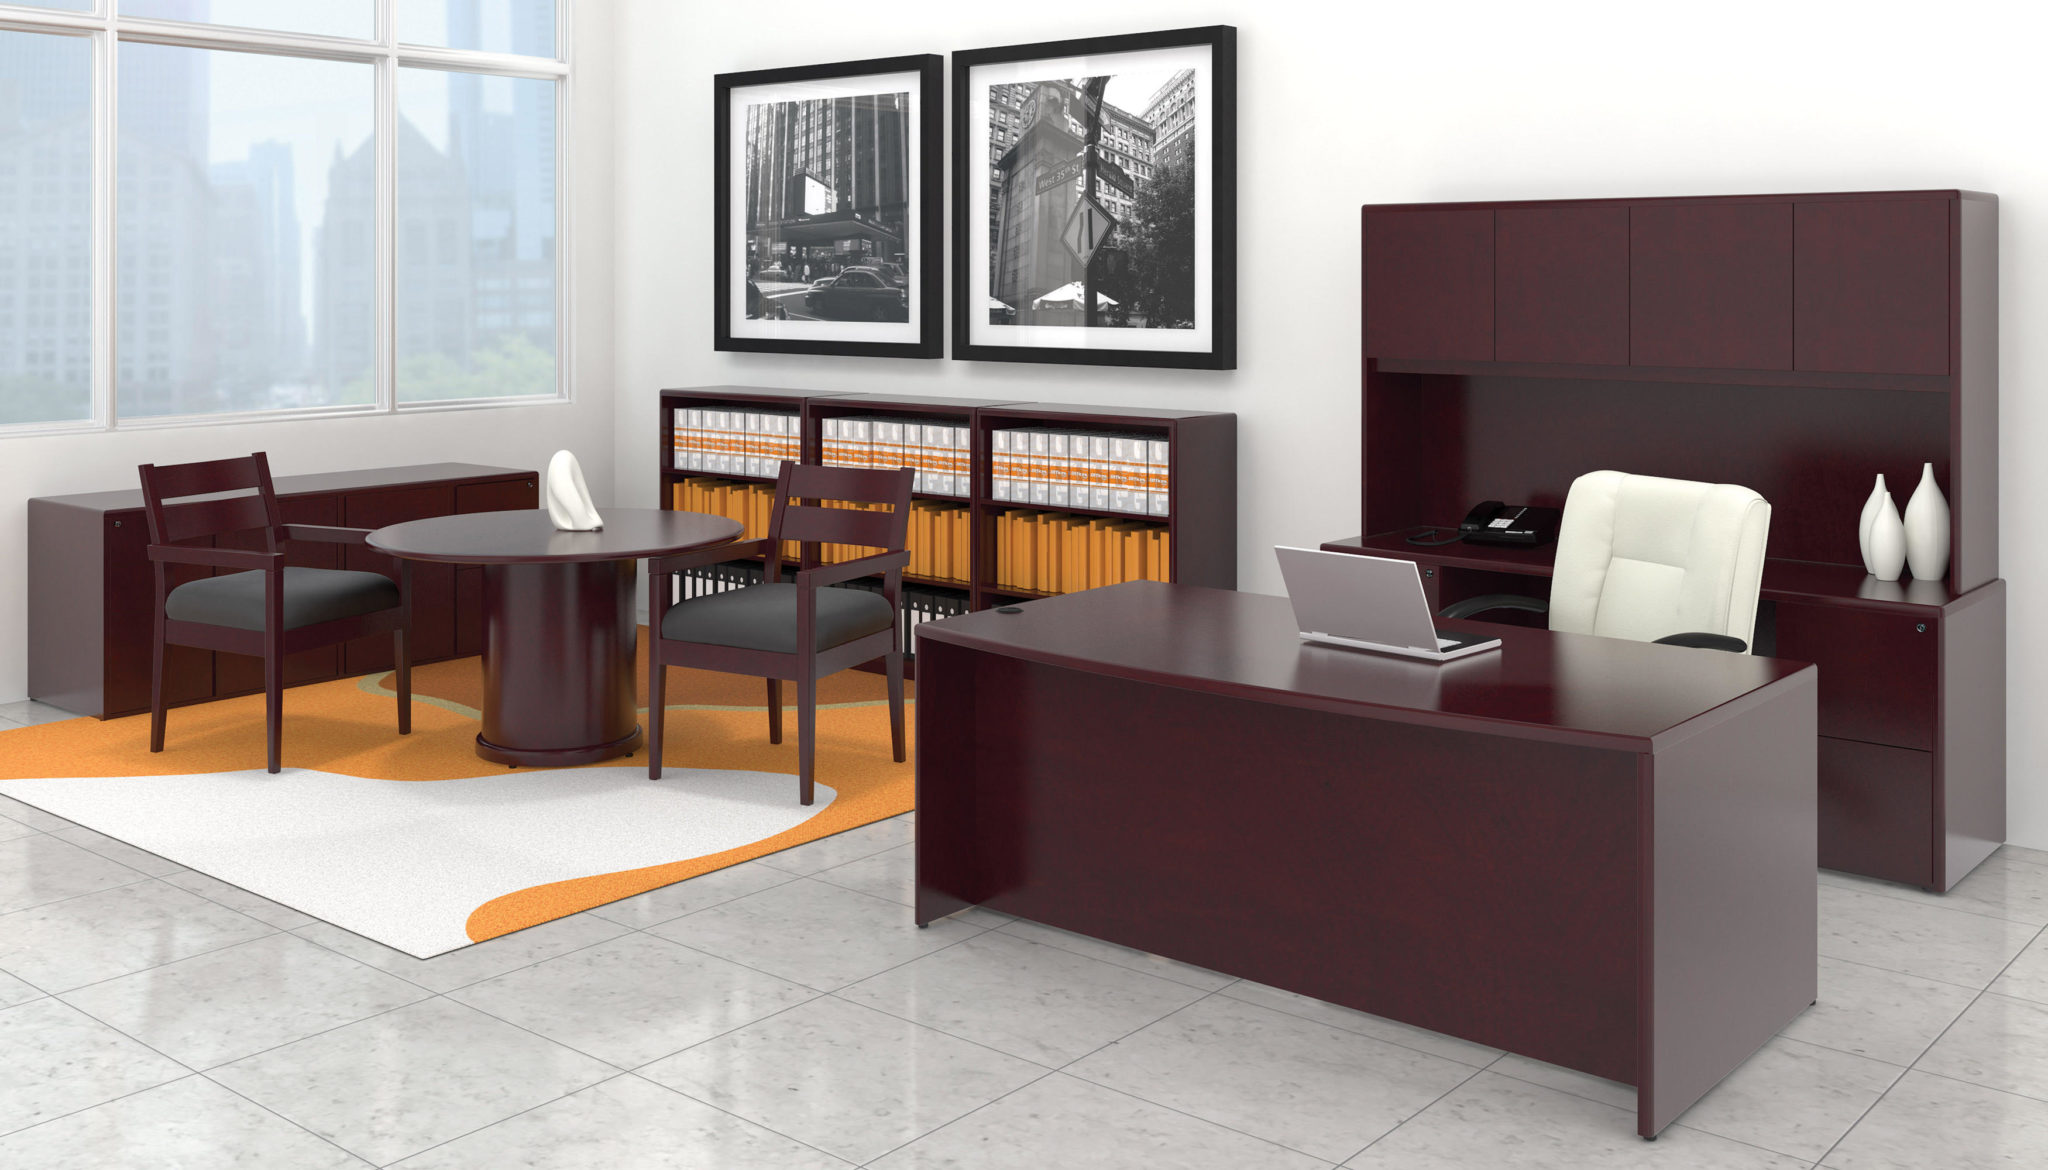 ace office furniture houston new used office furniture. Black Bedroom Furniture Sets. Home Design Ideas